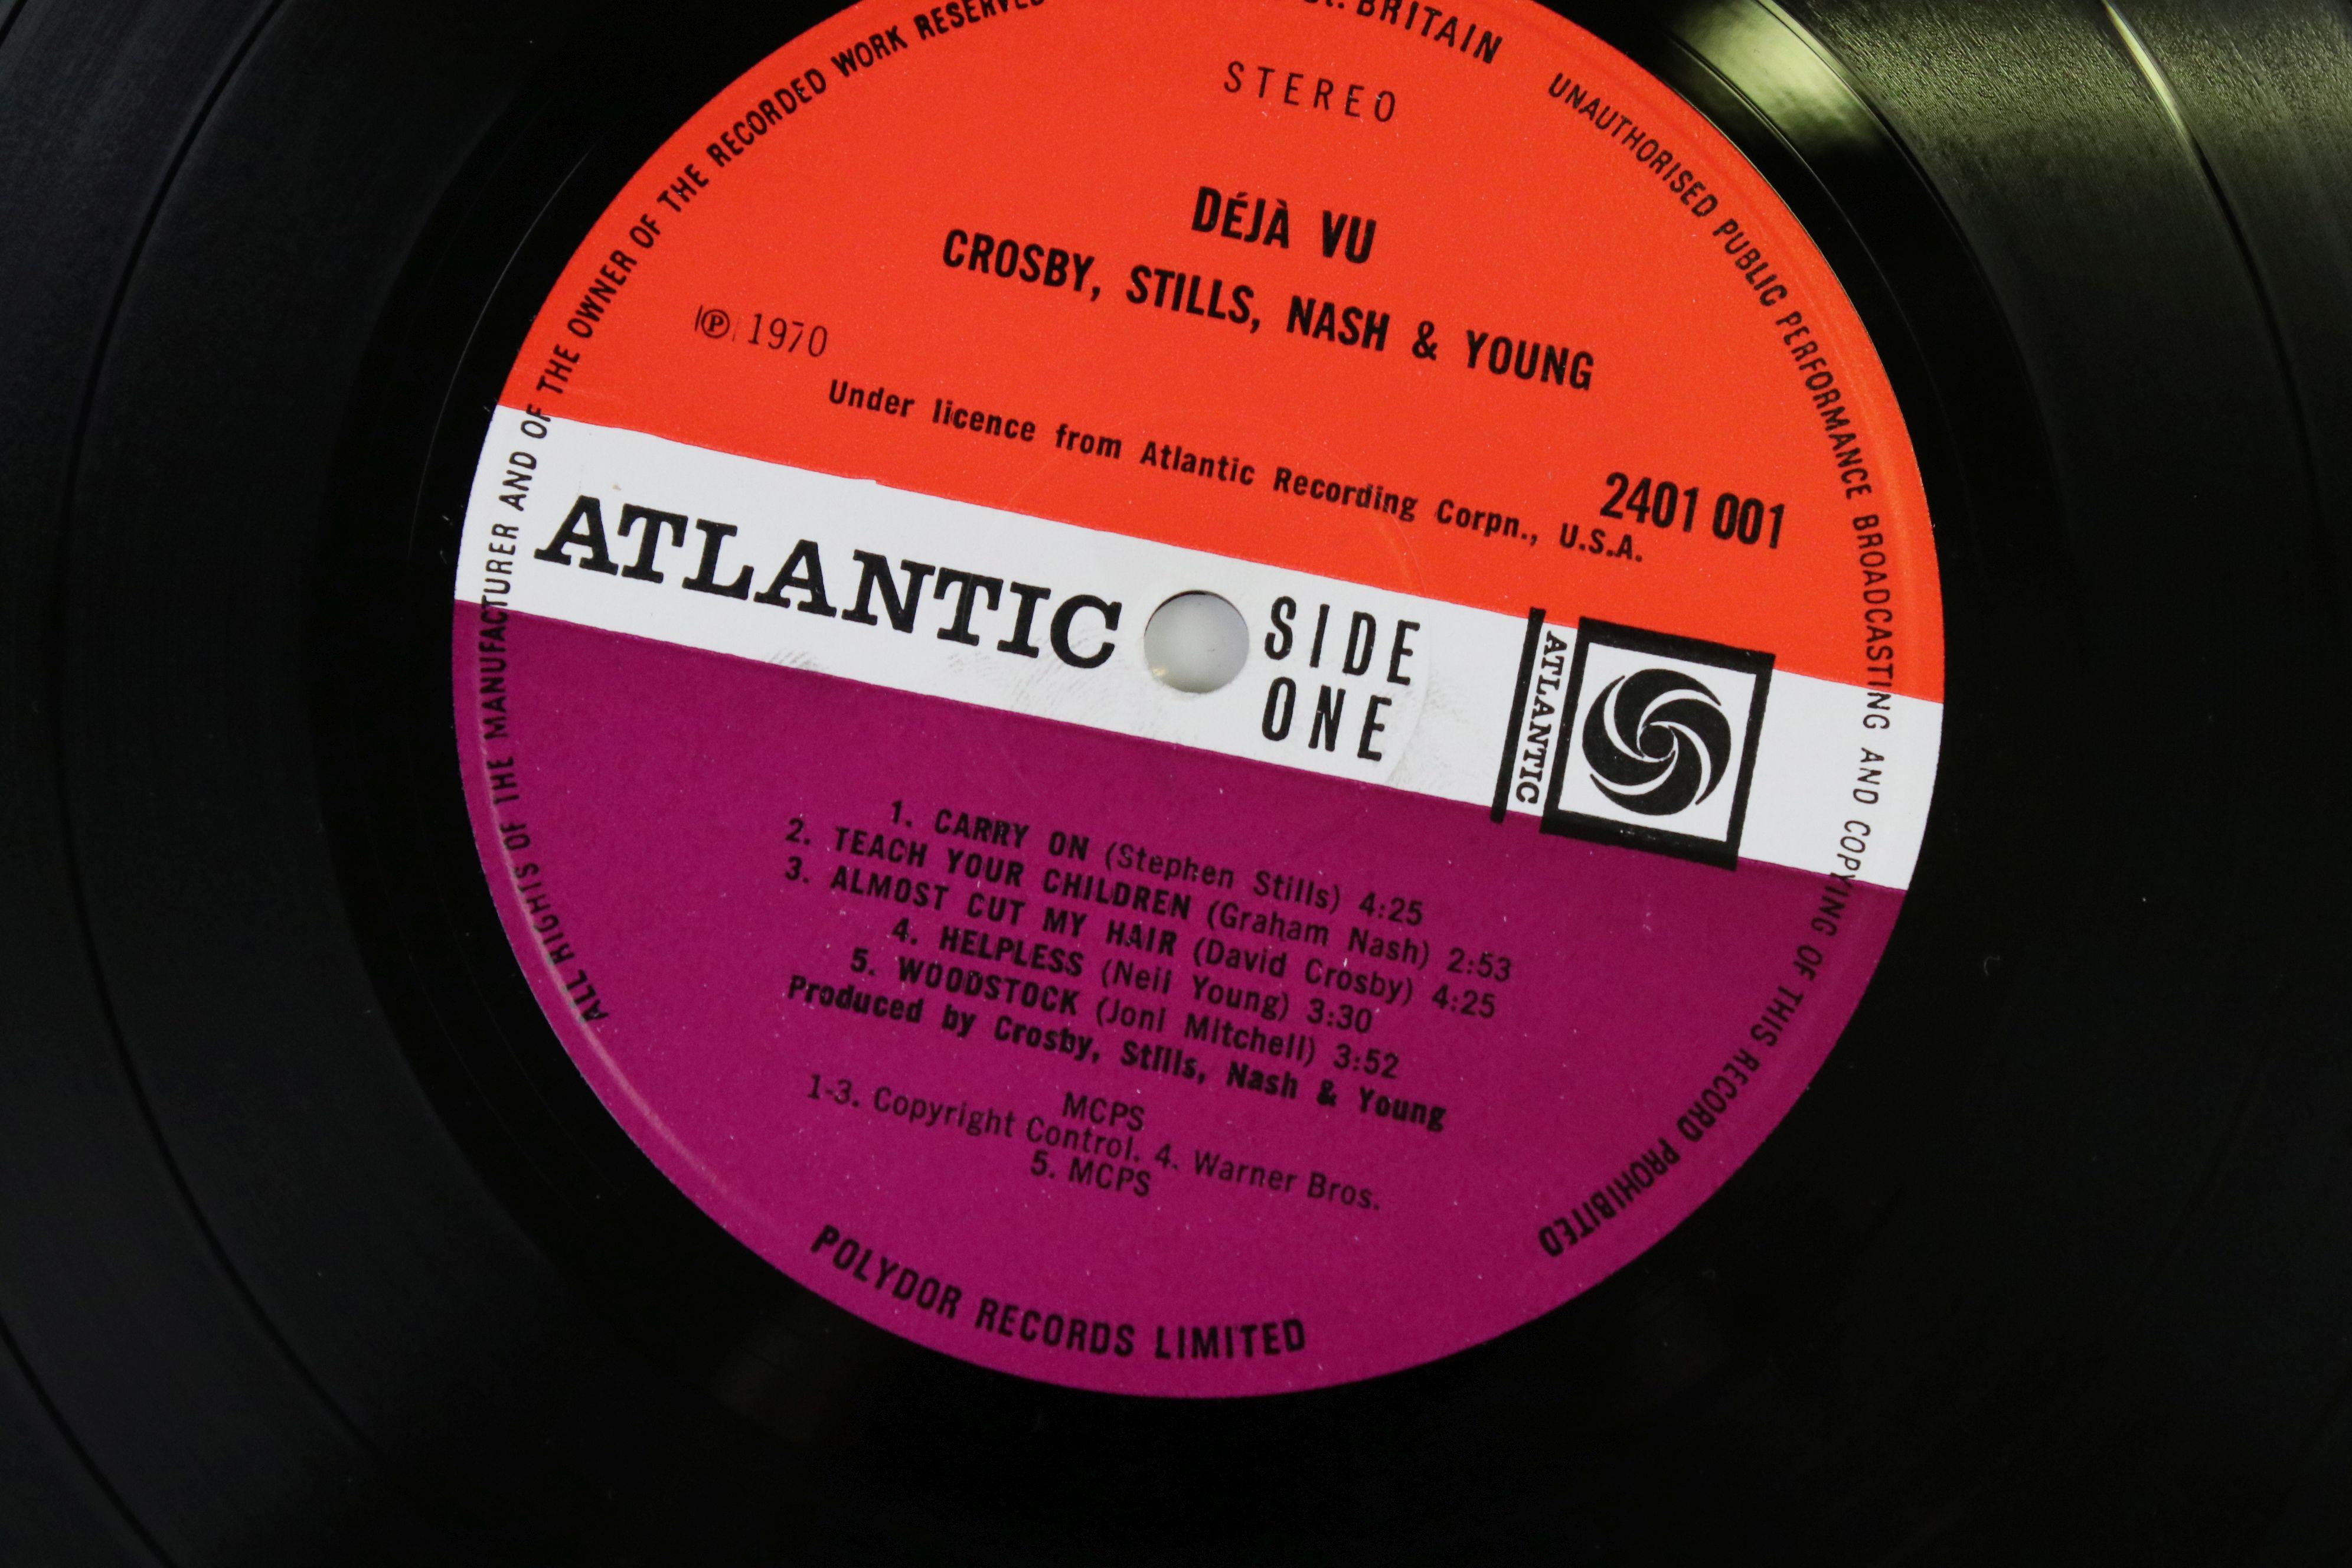 Vinyl - Crosby, Stills, Nash & Young Deja Vu (Atlantic 2401 001) red and plum Atlantic label with - Image 4 of 4